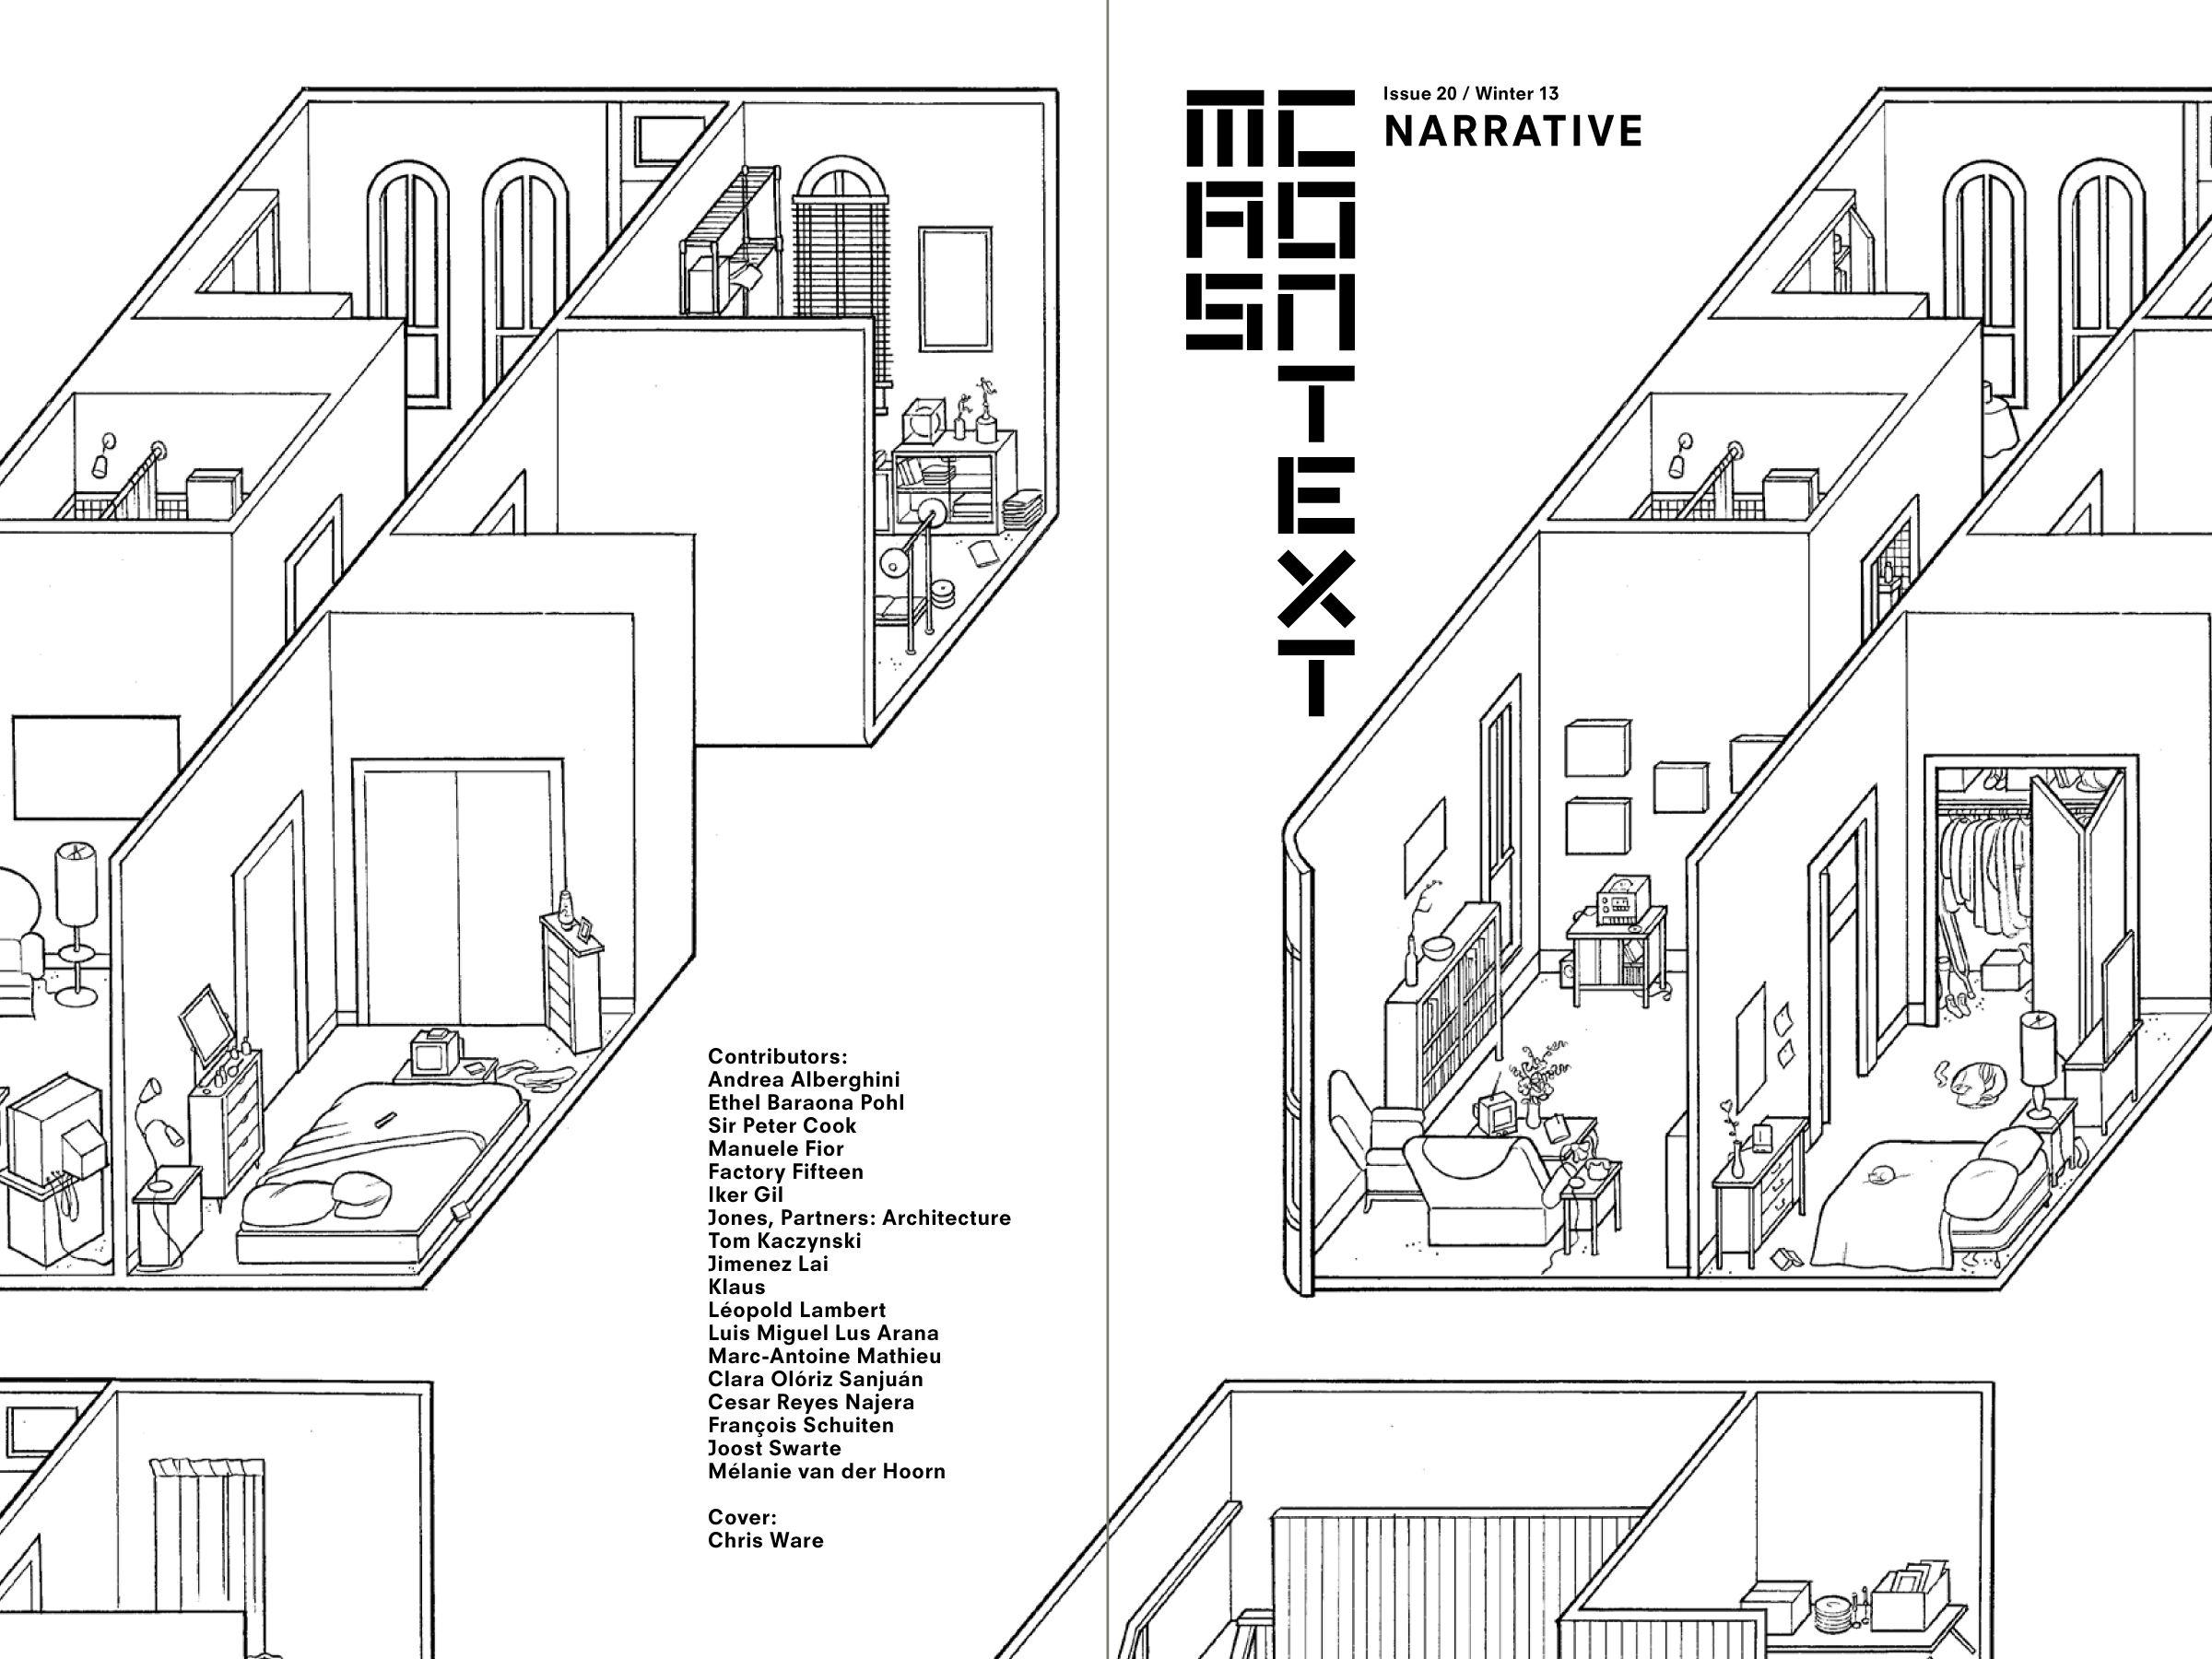 Jimenez Lai Cartoonish Architecture